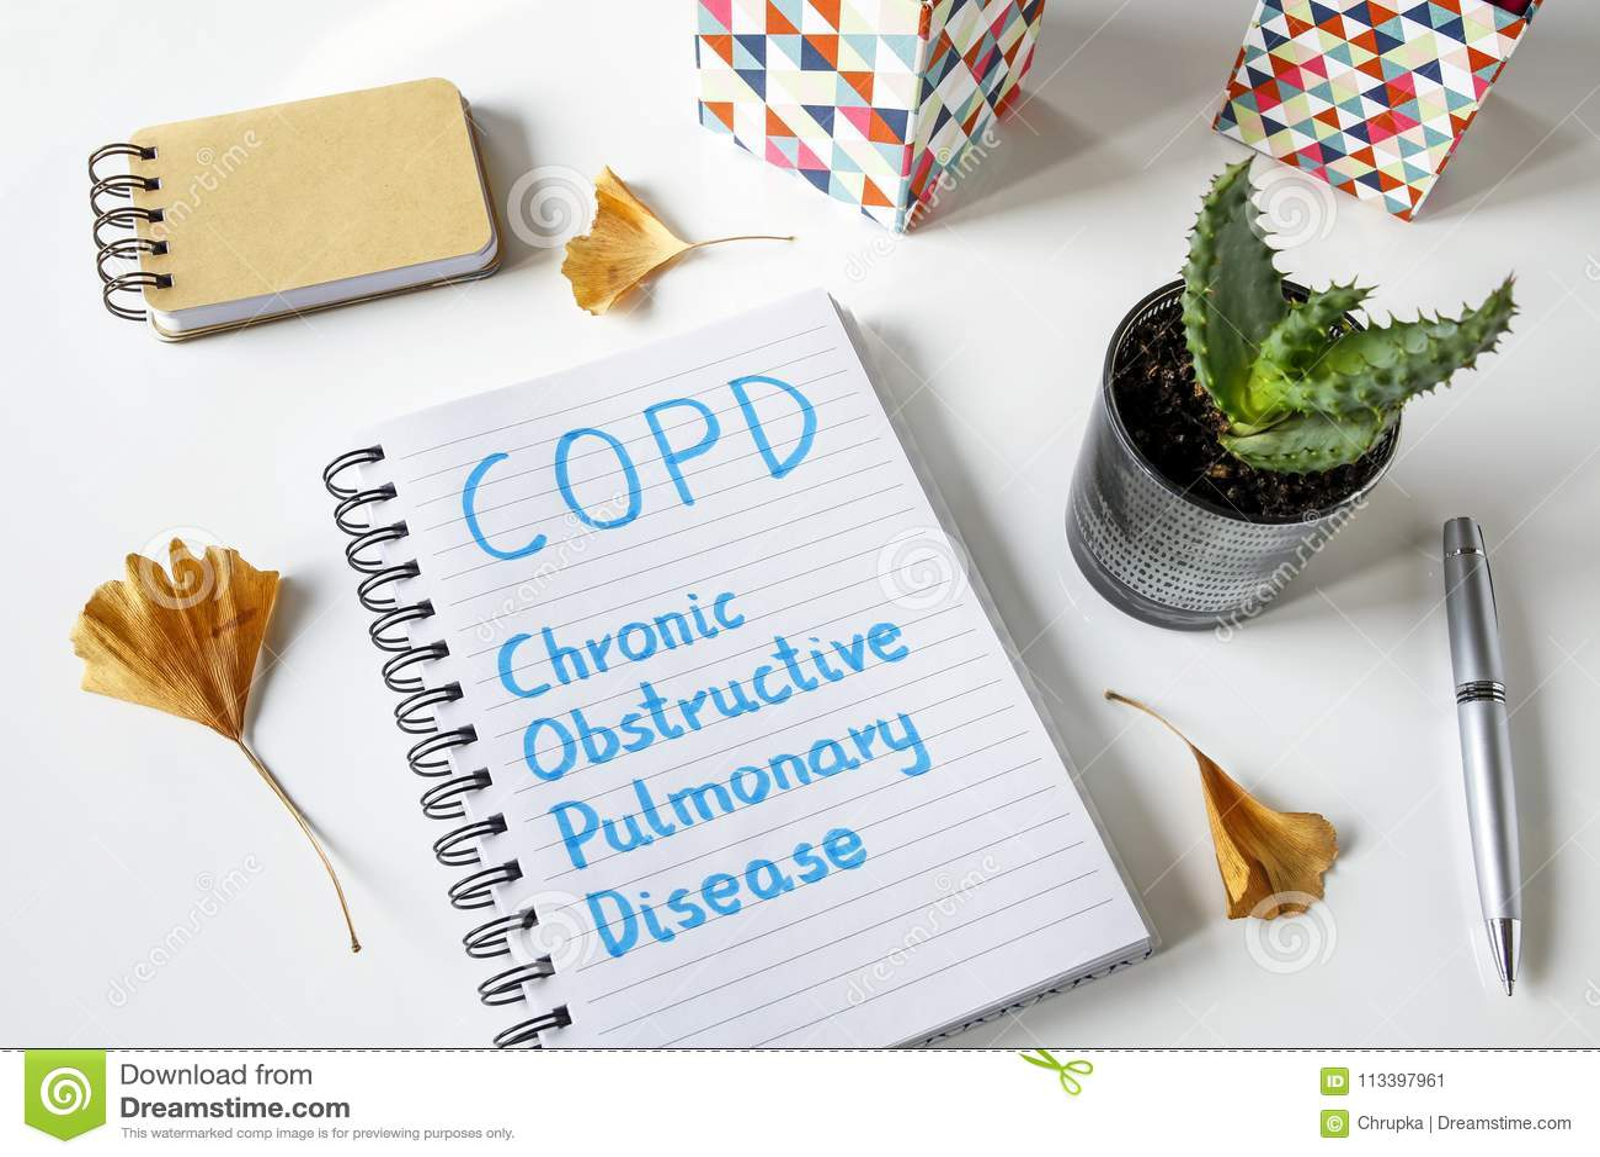 COPD Chronic Obstructive Pulmonary Disease written in notebook